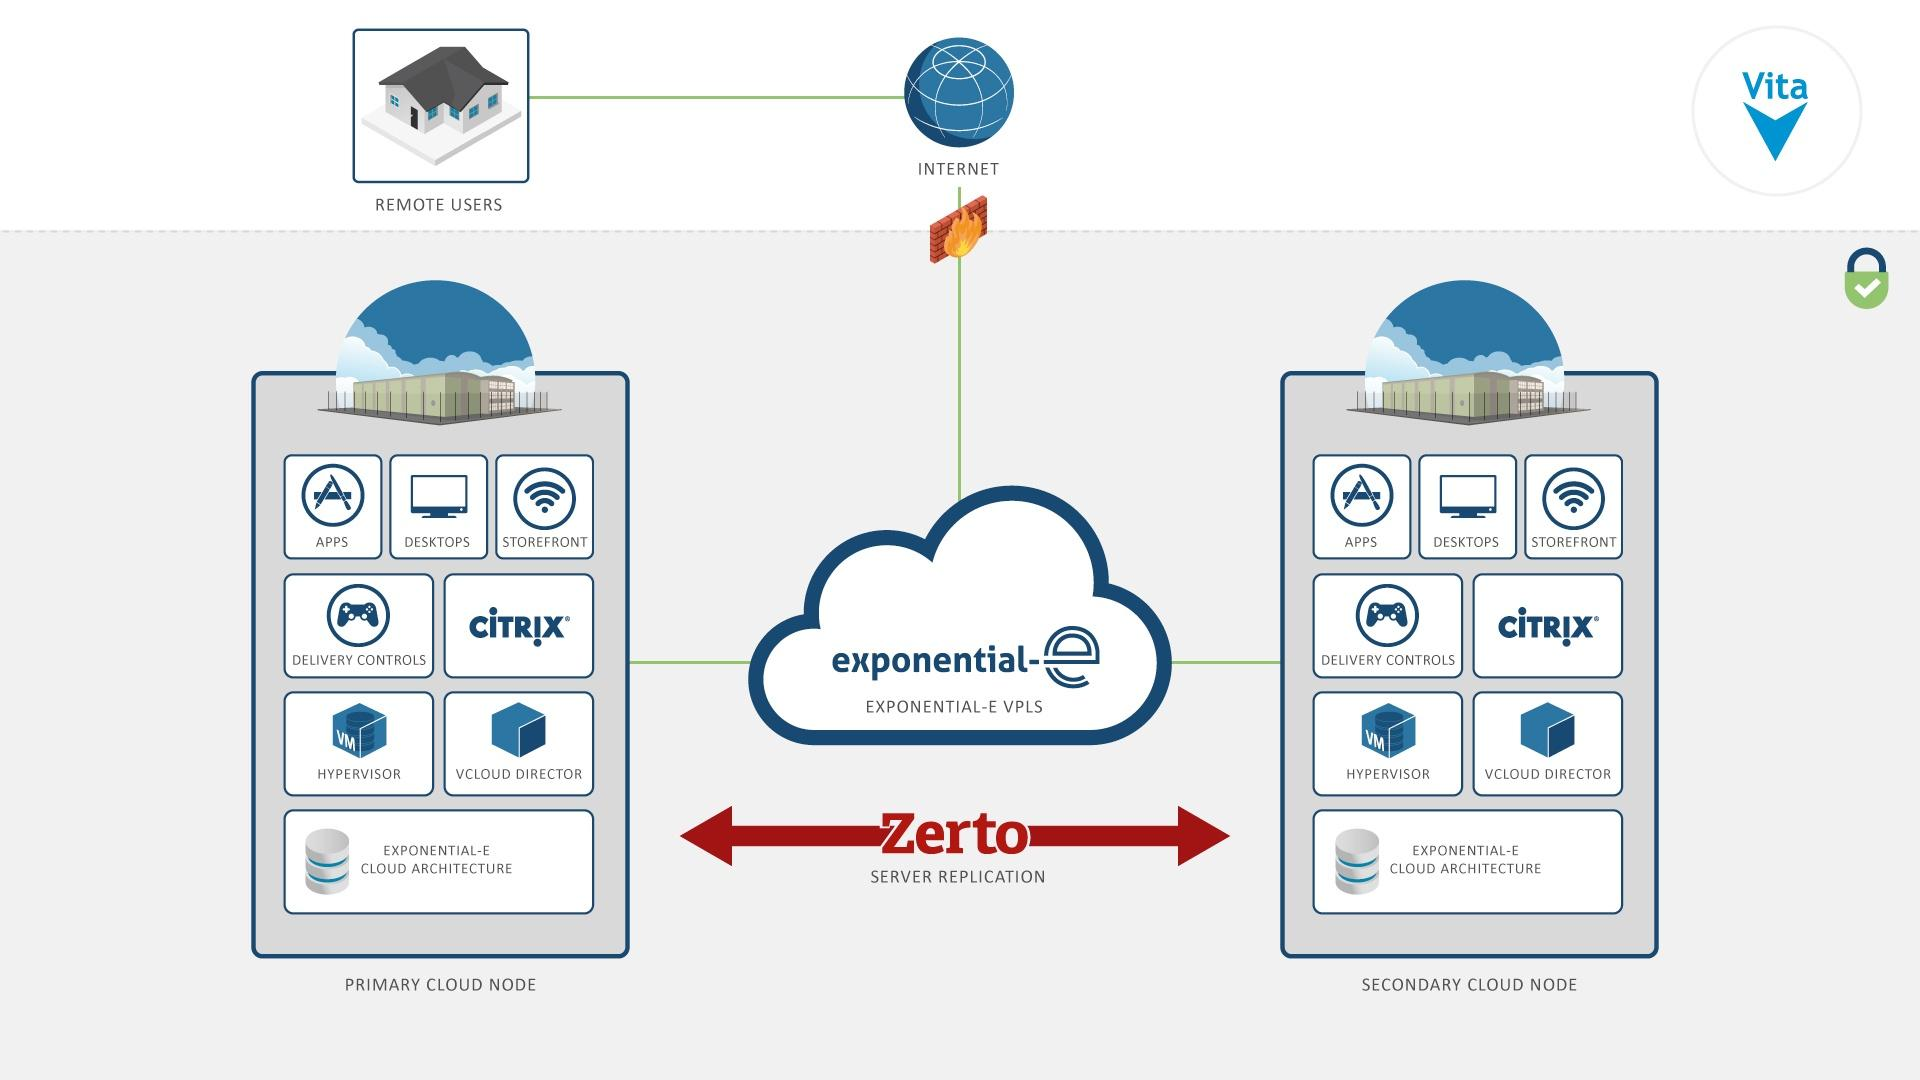 Citrix Service Provider Partner for VDI and more